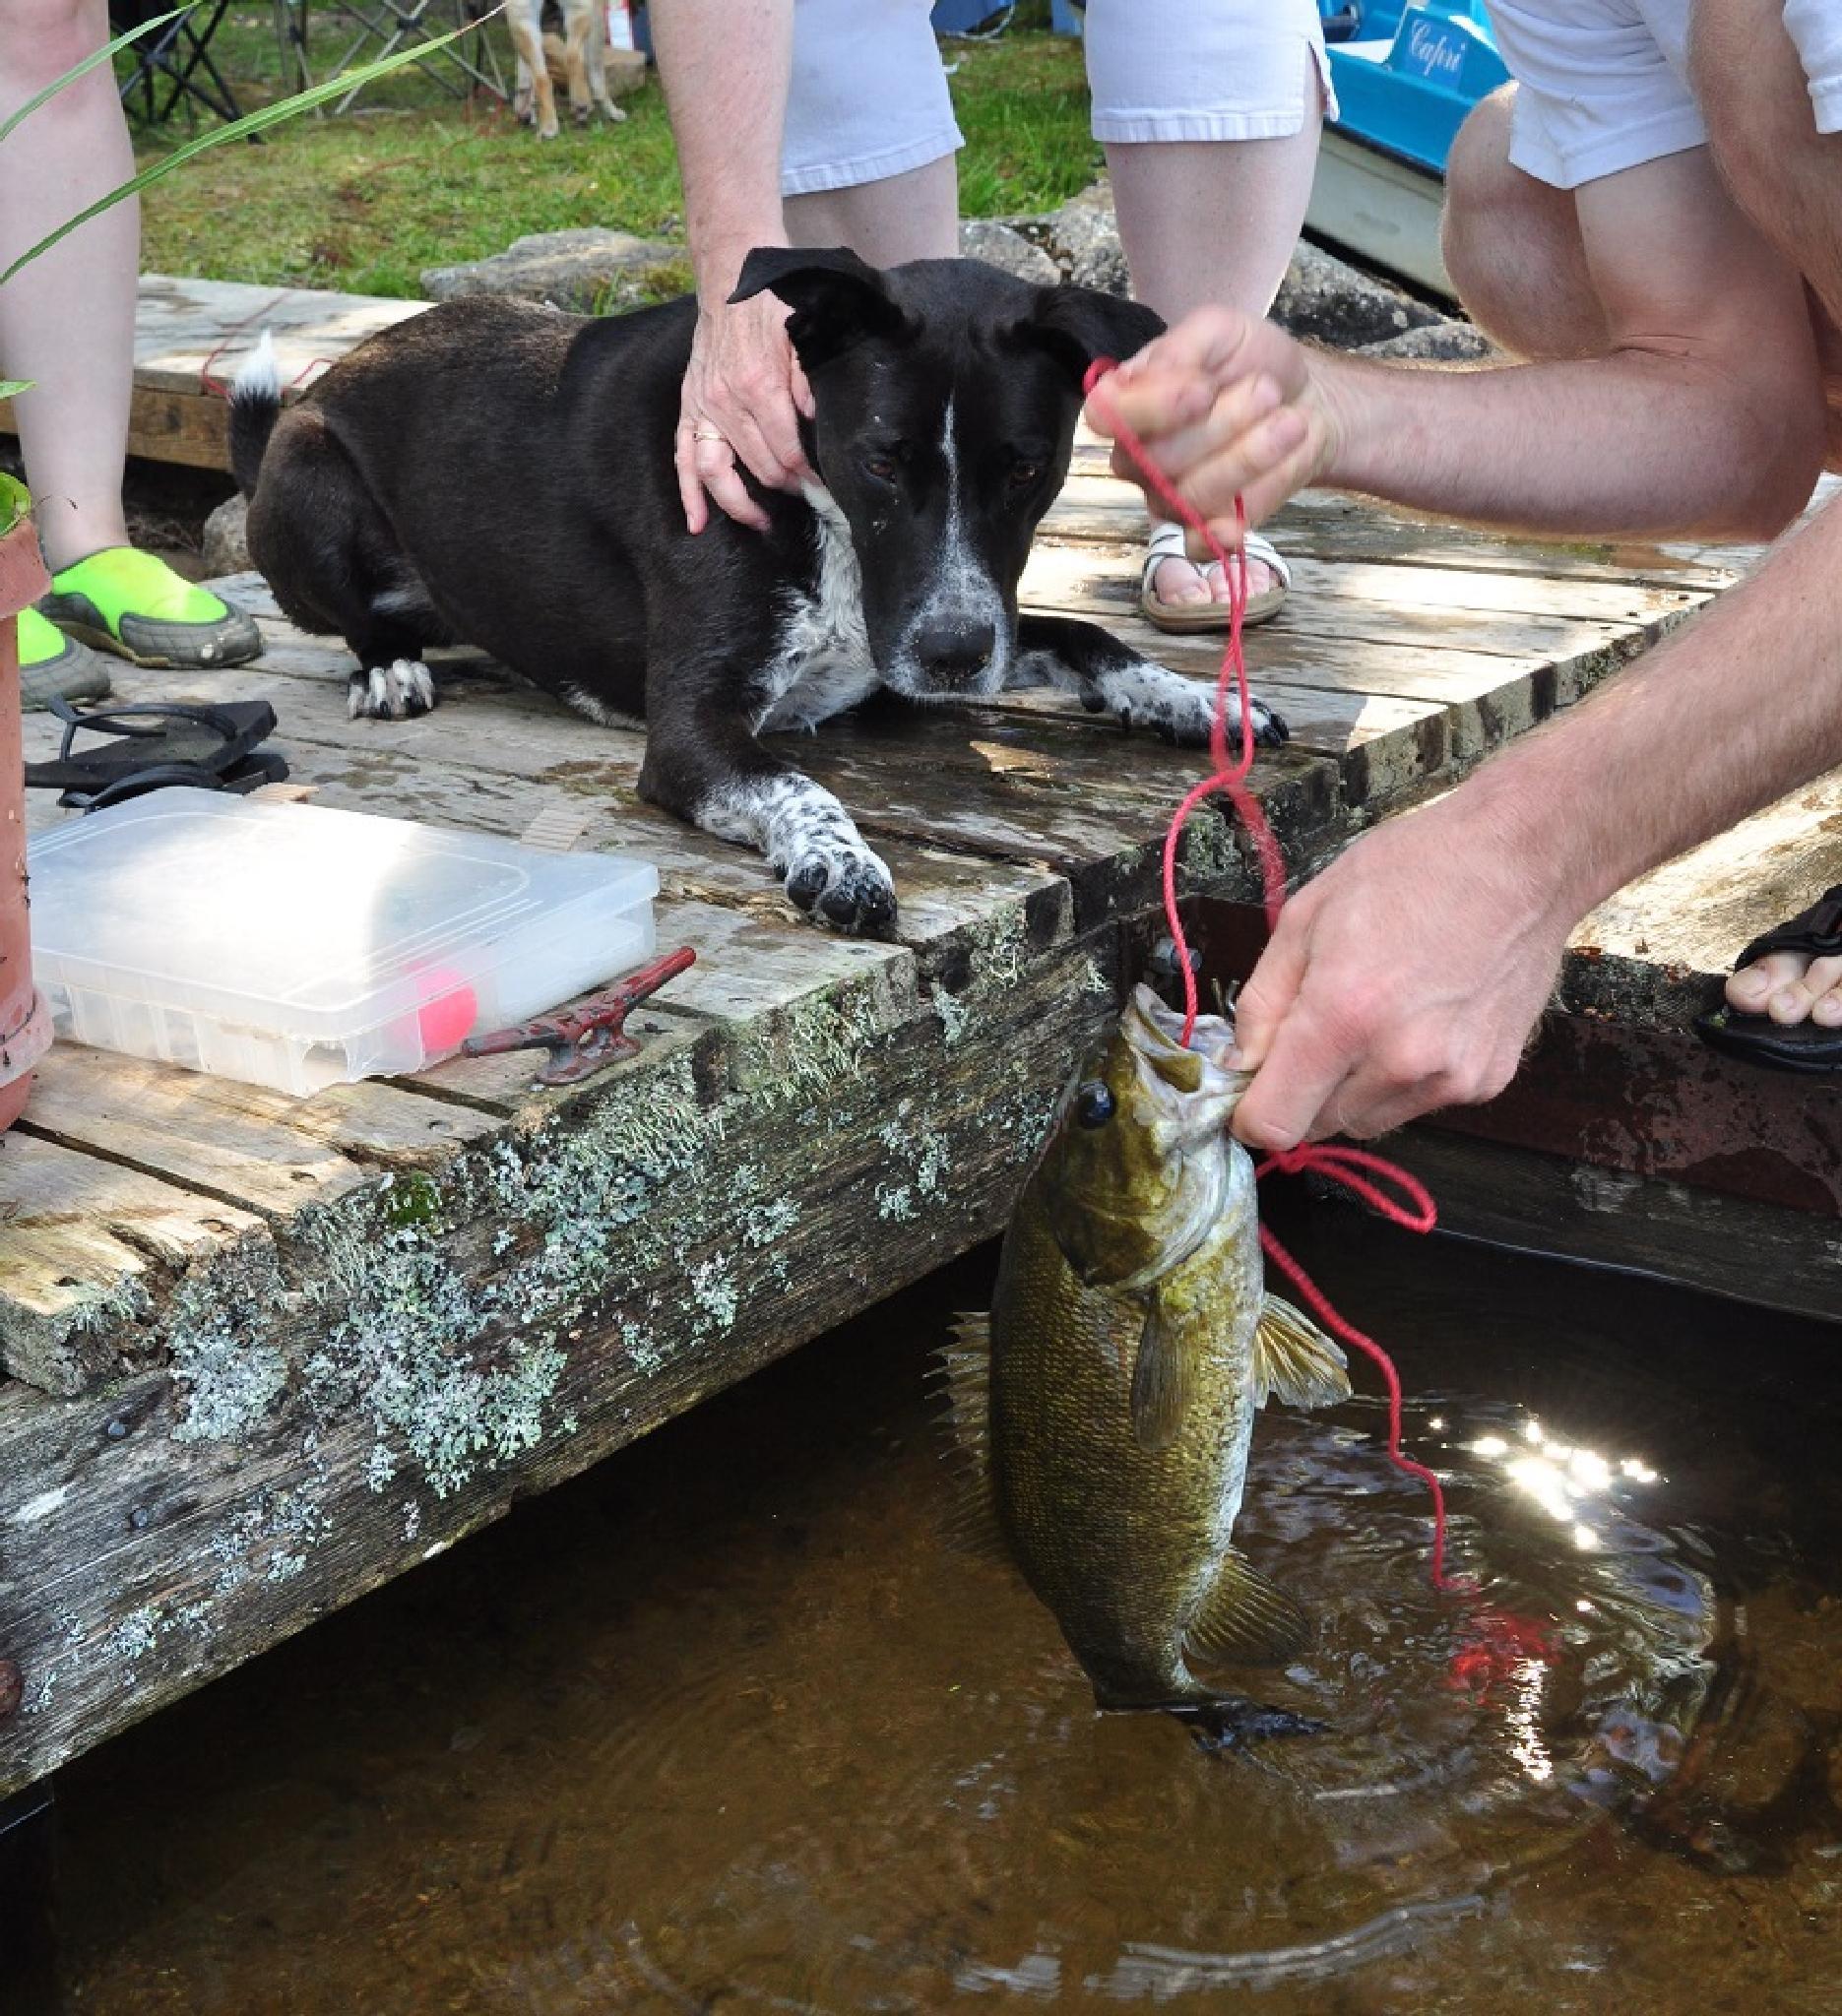 Dog & Fish by cole26_woy